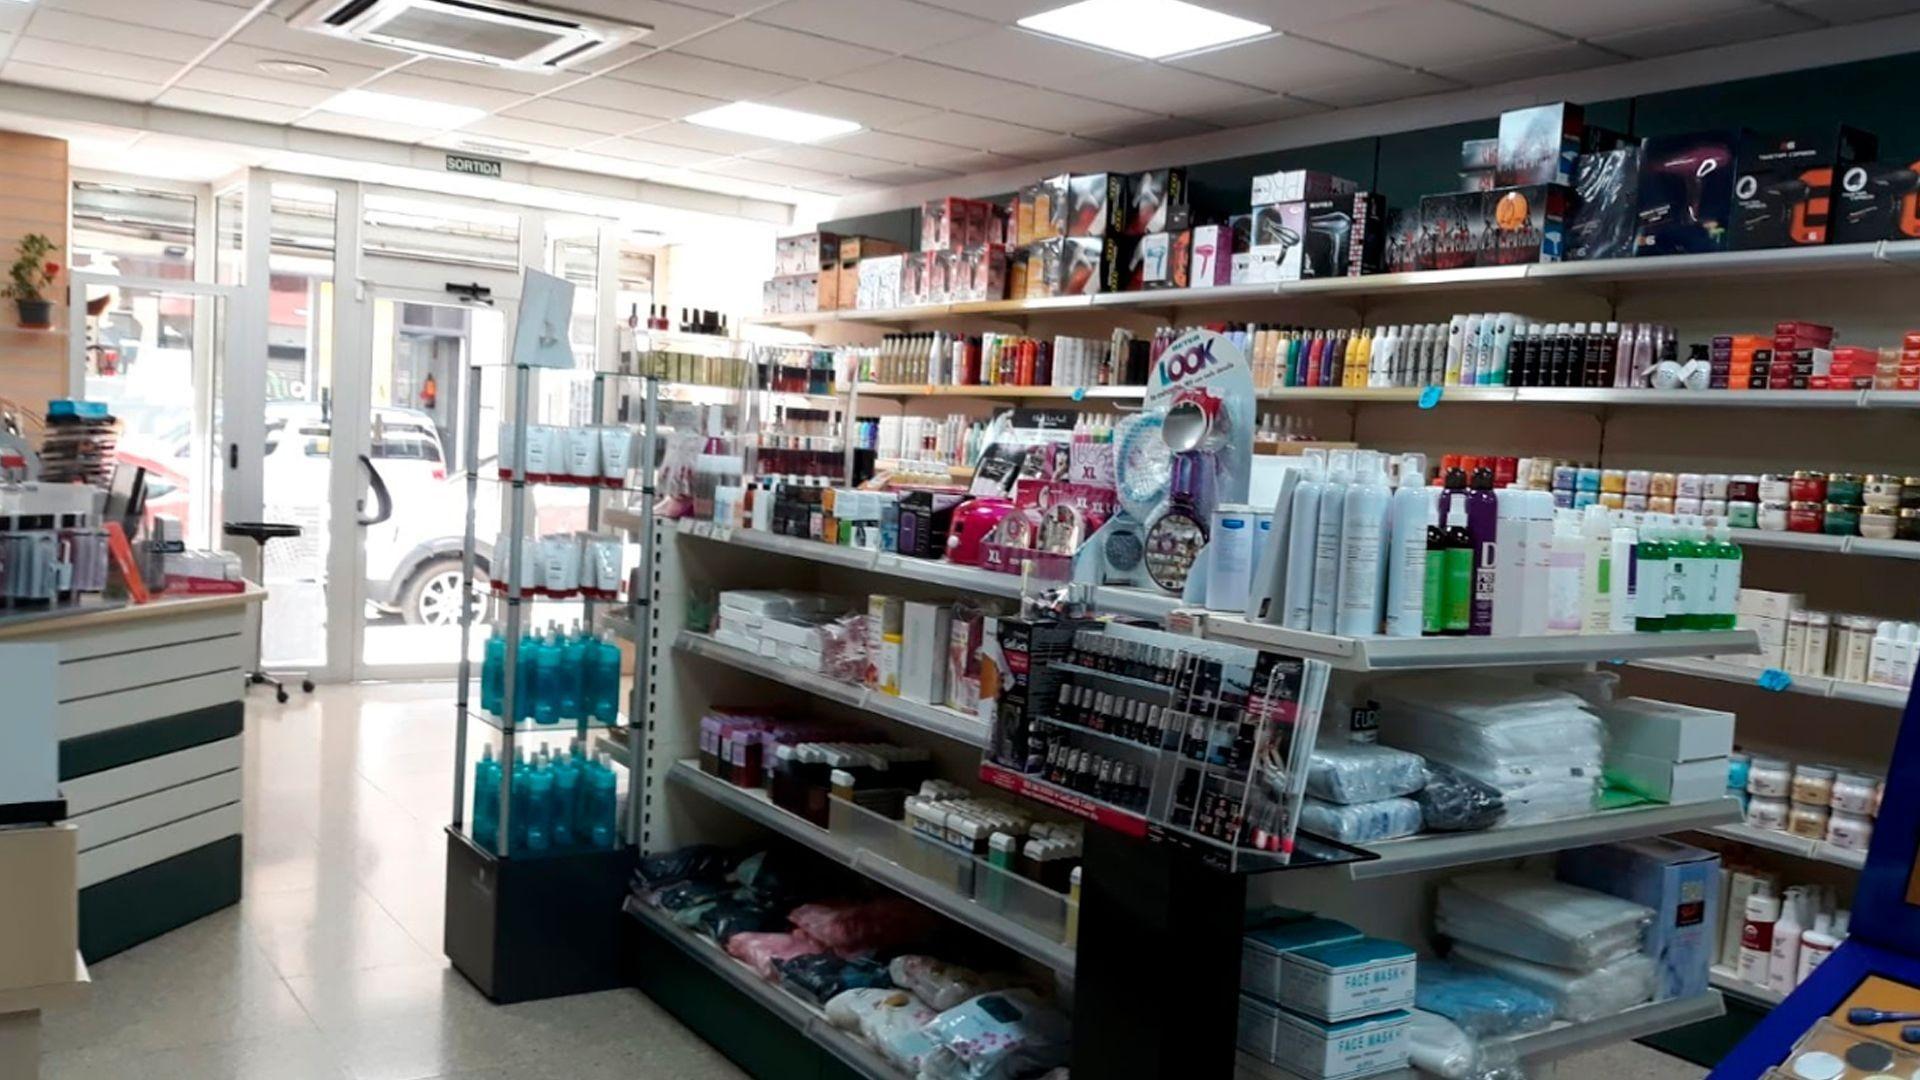 Venta de productos para peluquería en Girona